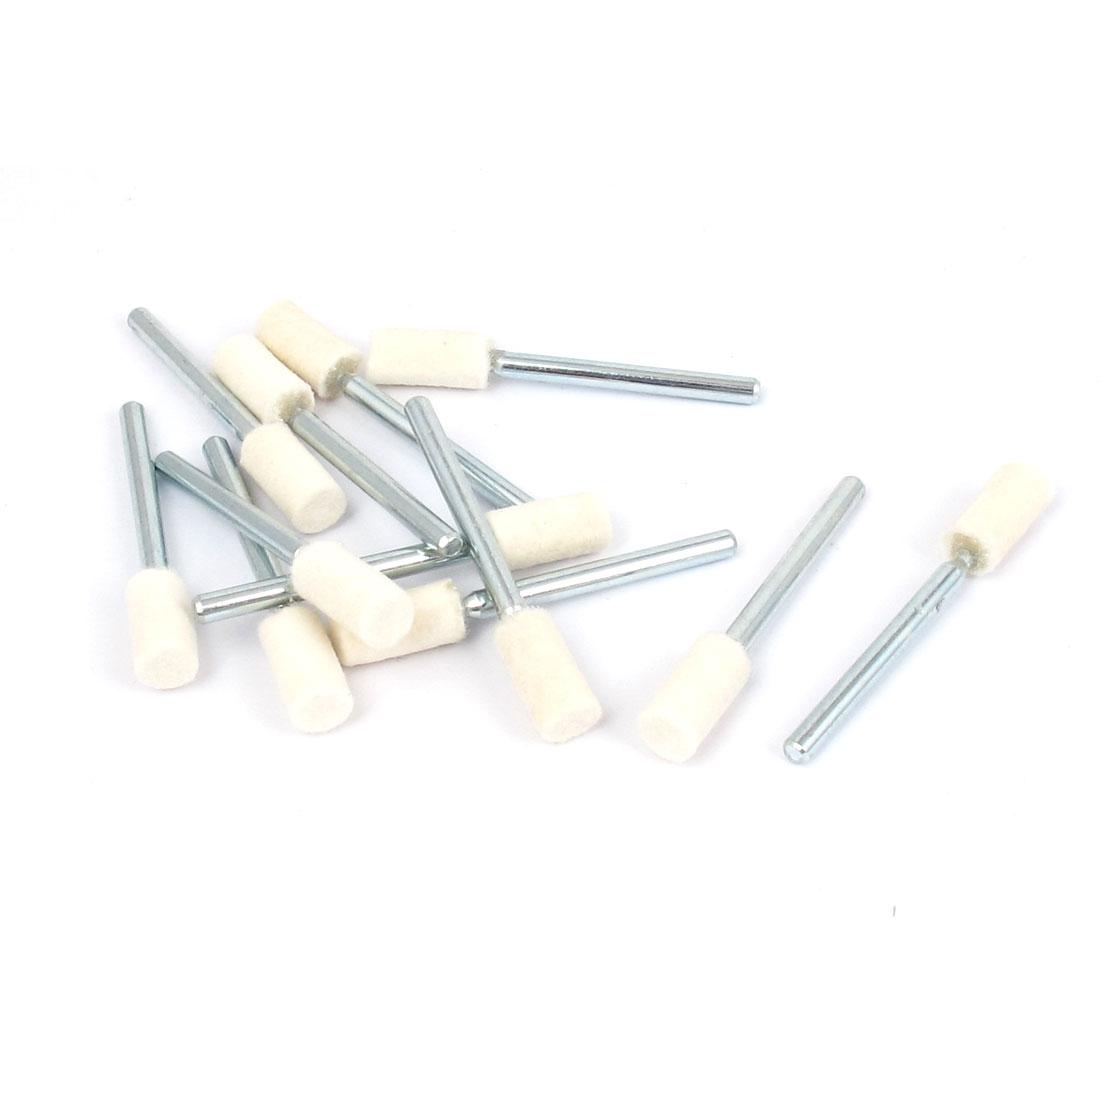 12pcs Polishing 3mm Dia Shank 6mmx13mm Cylinder Shaped Head Felt Bobs Rotary Tool